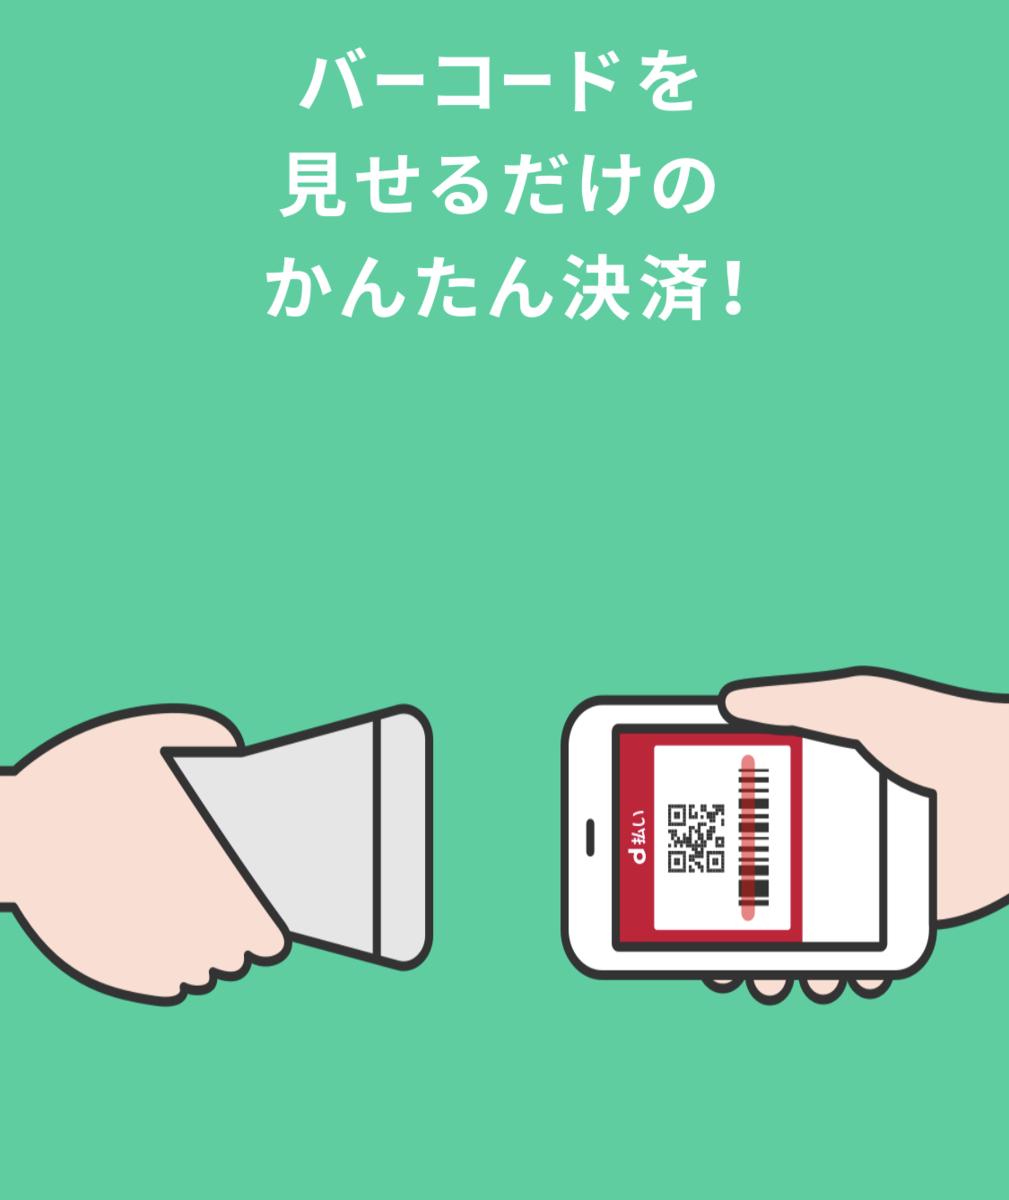 f:id:Sabuaka:20190717014720p:plain